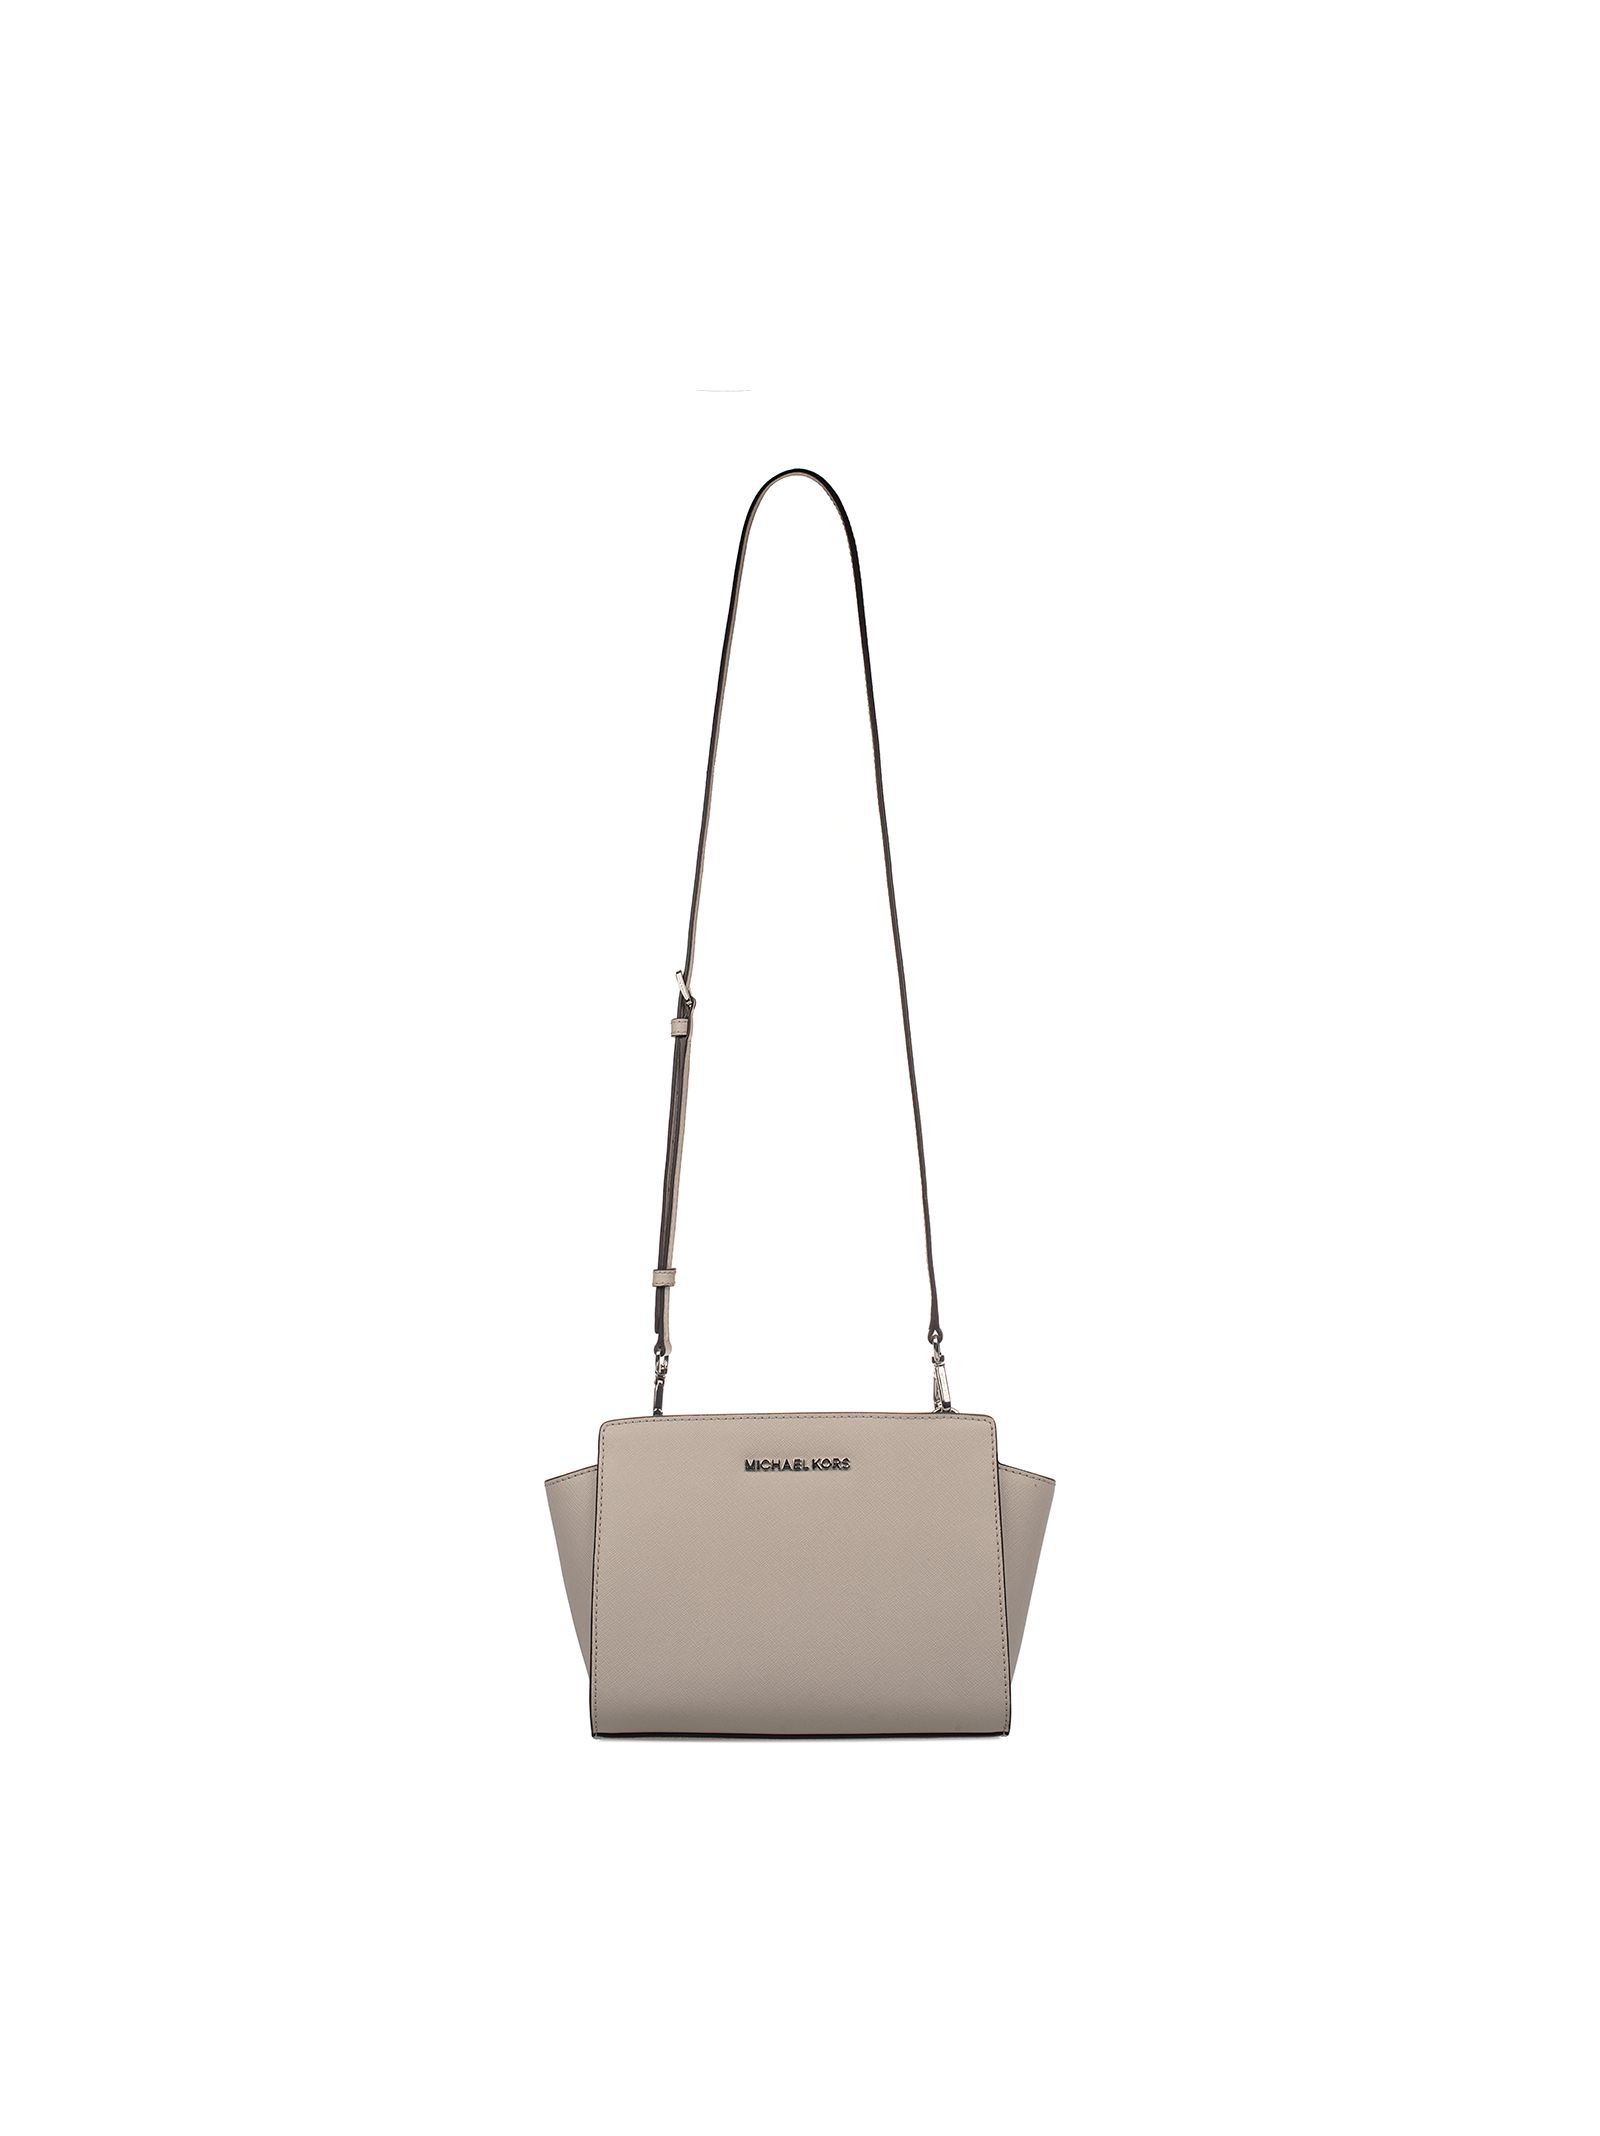 michael kors female cement selma saffiano leather large shoulder bag